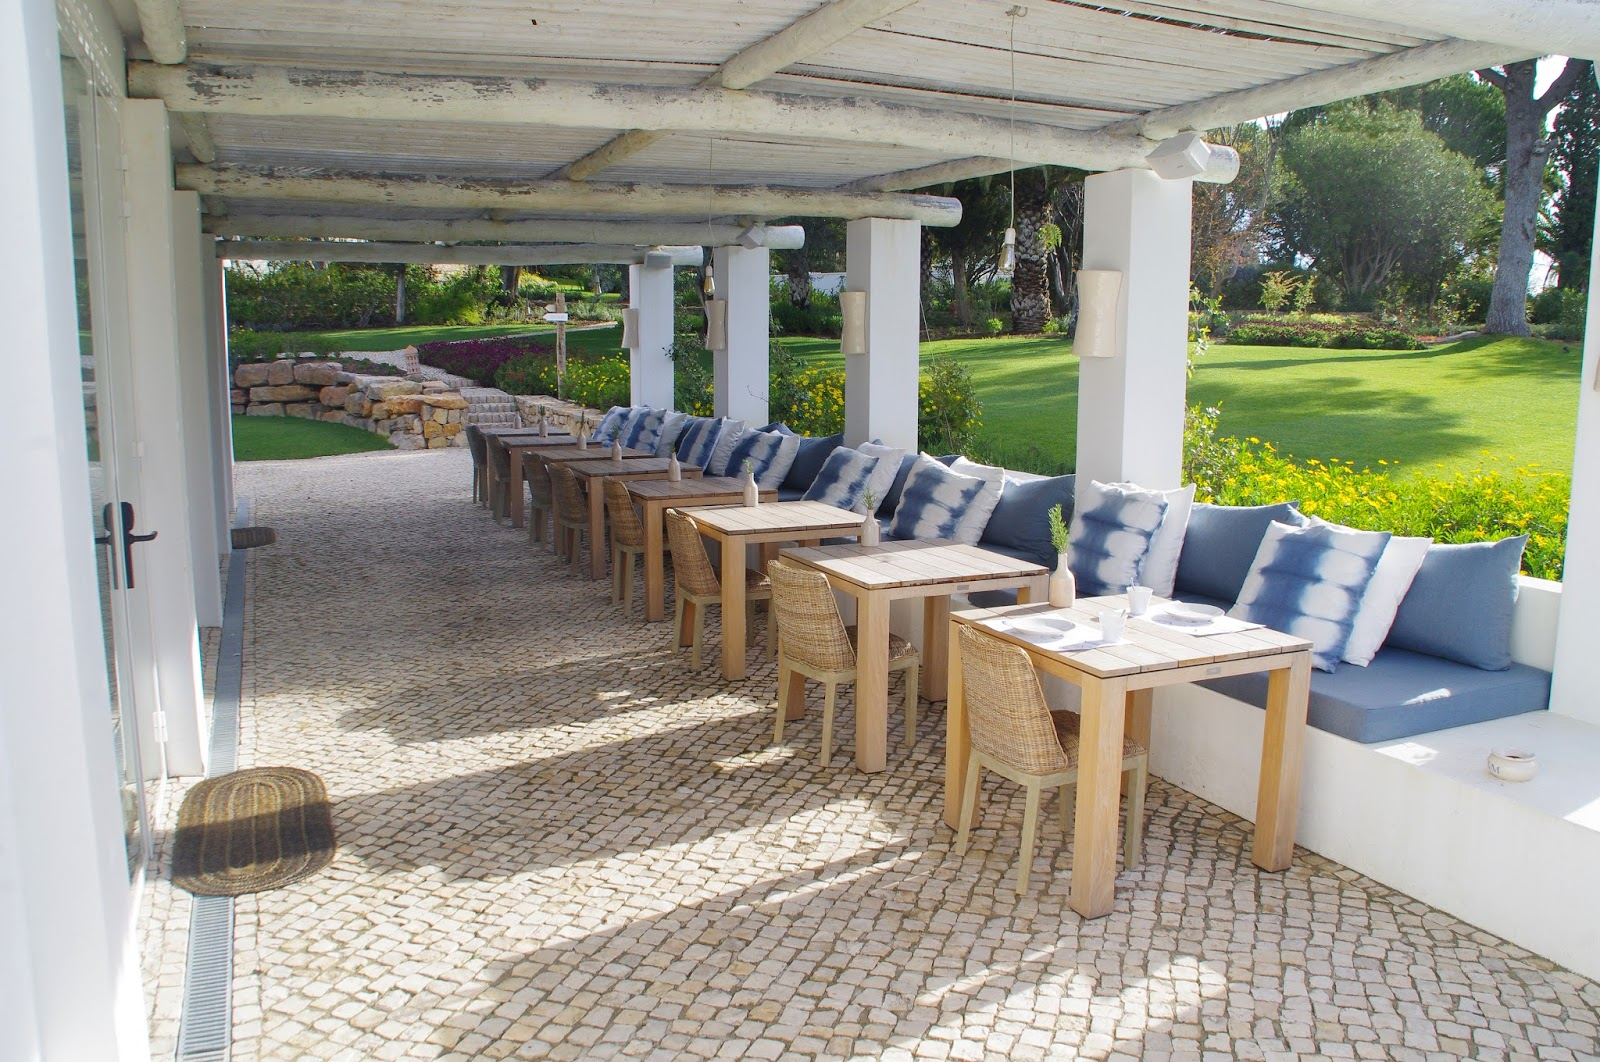 Vila Monte Farm House Outdoor Seating